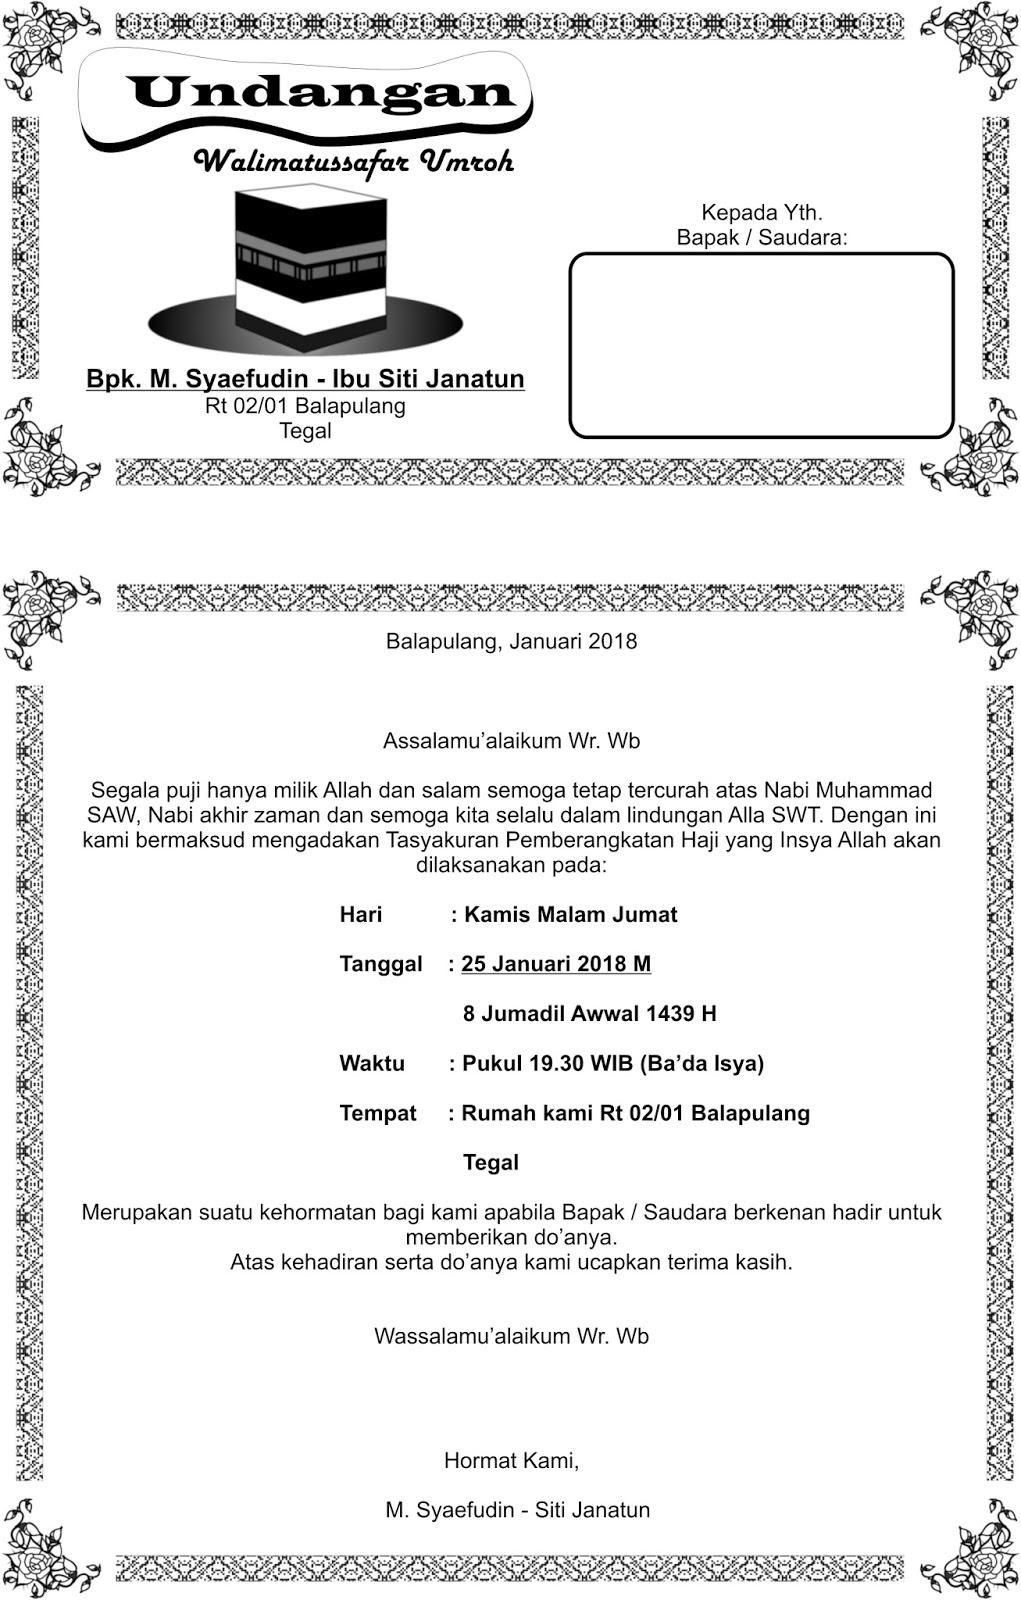 Contoh Undangan Walimatul Umroh : contoh, undangan, walimatul, umroh, Undangan, Walimatussafar, Umroh, Document